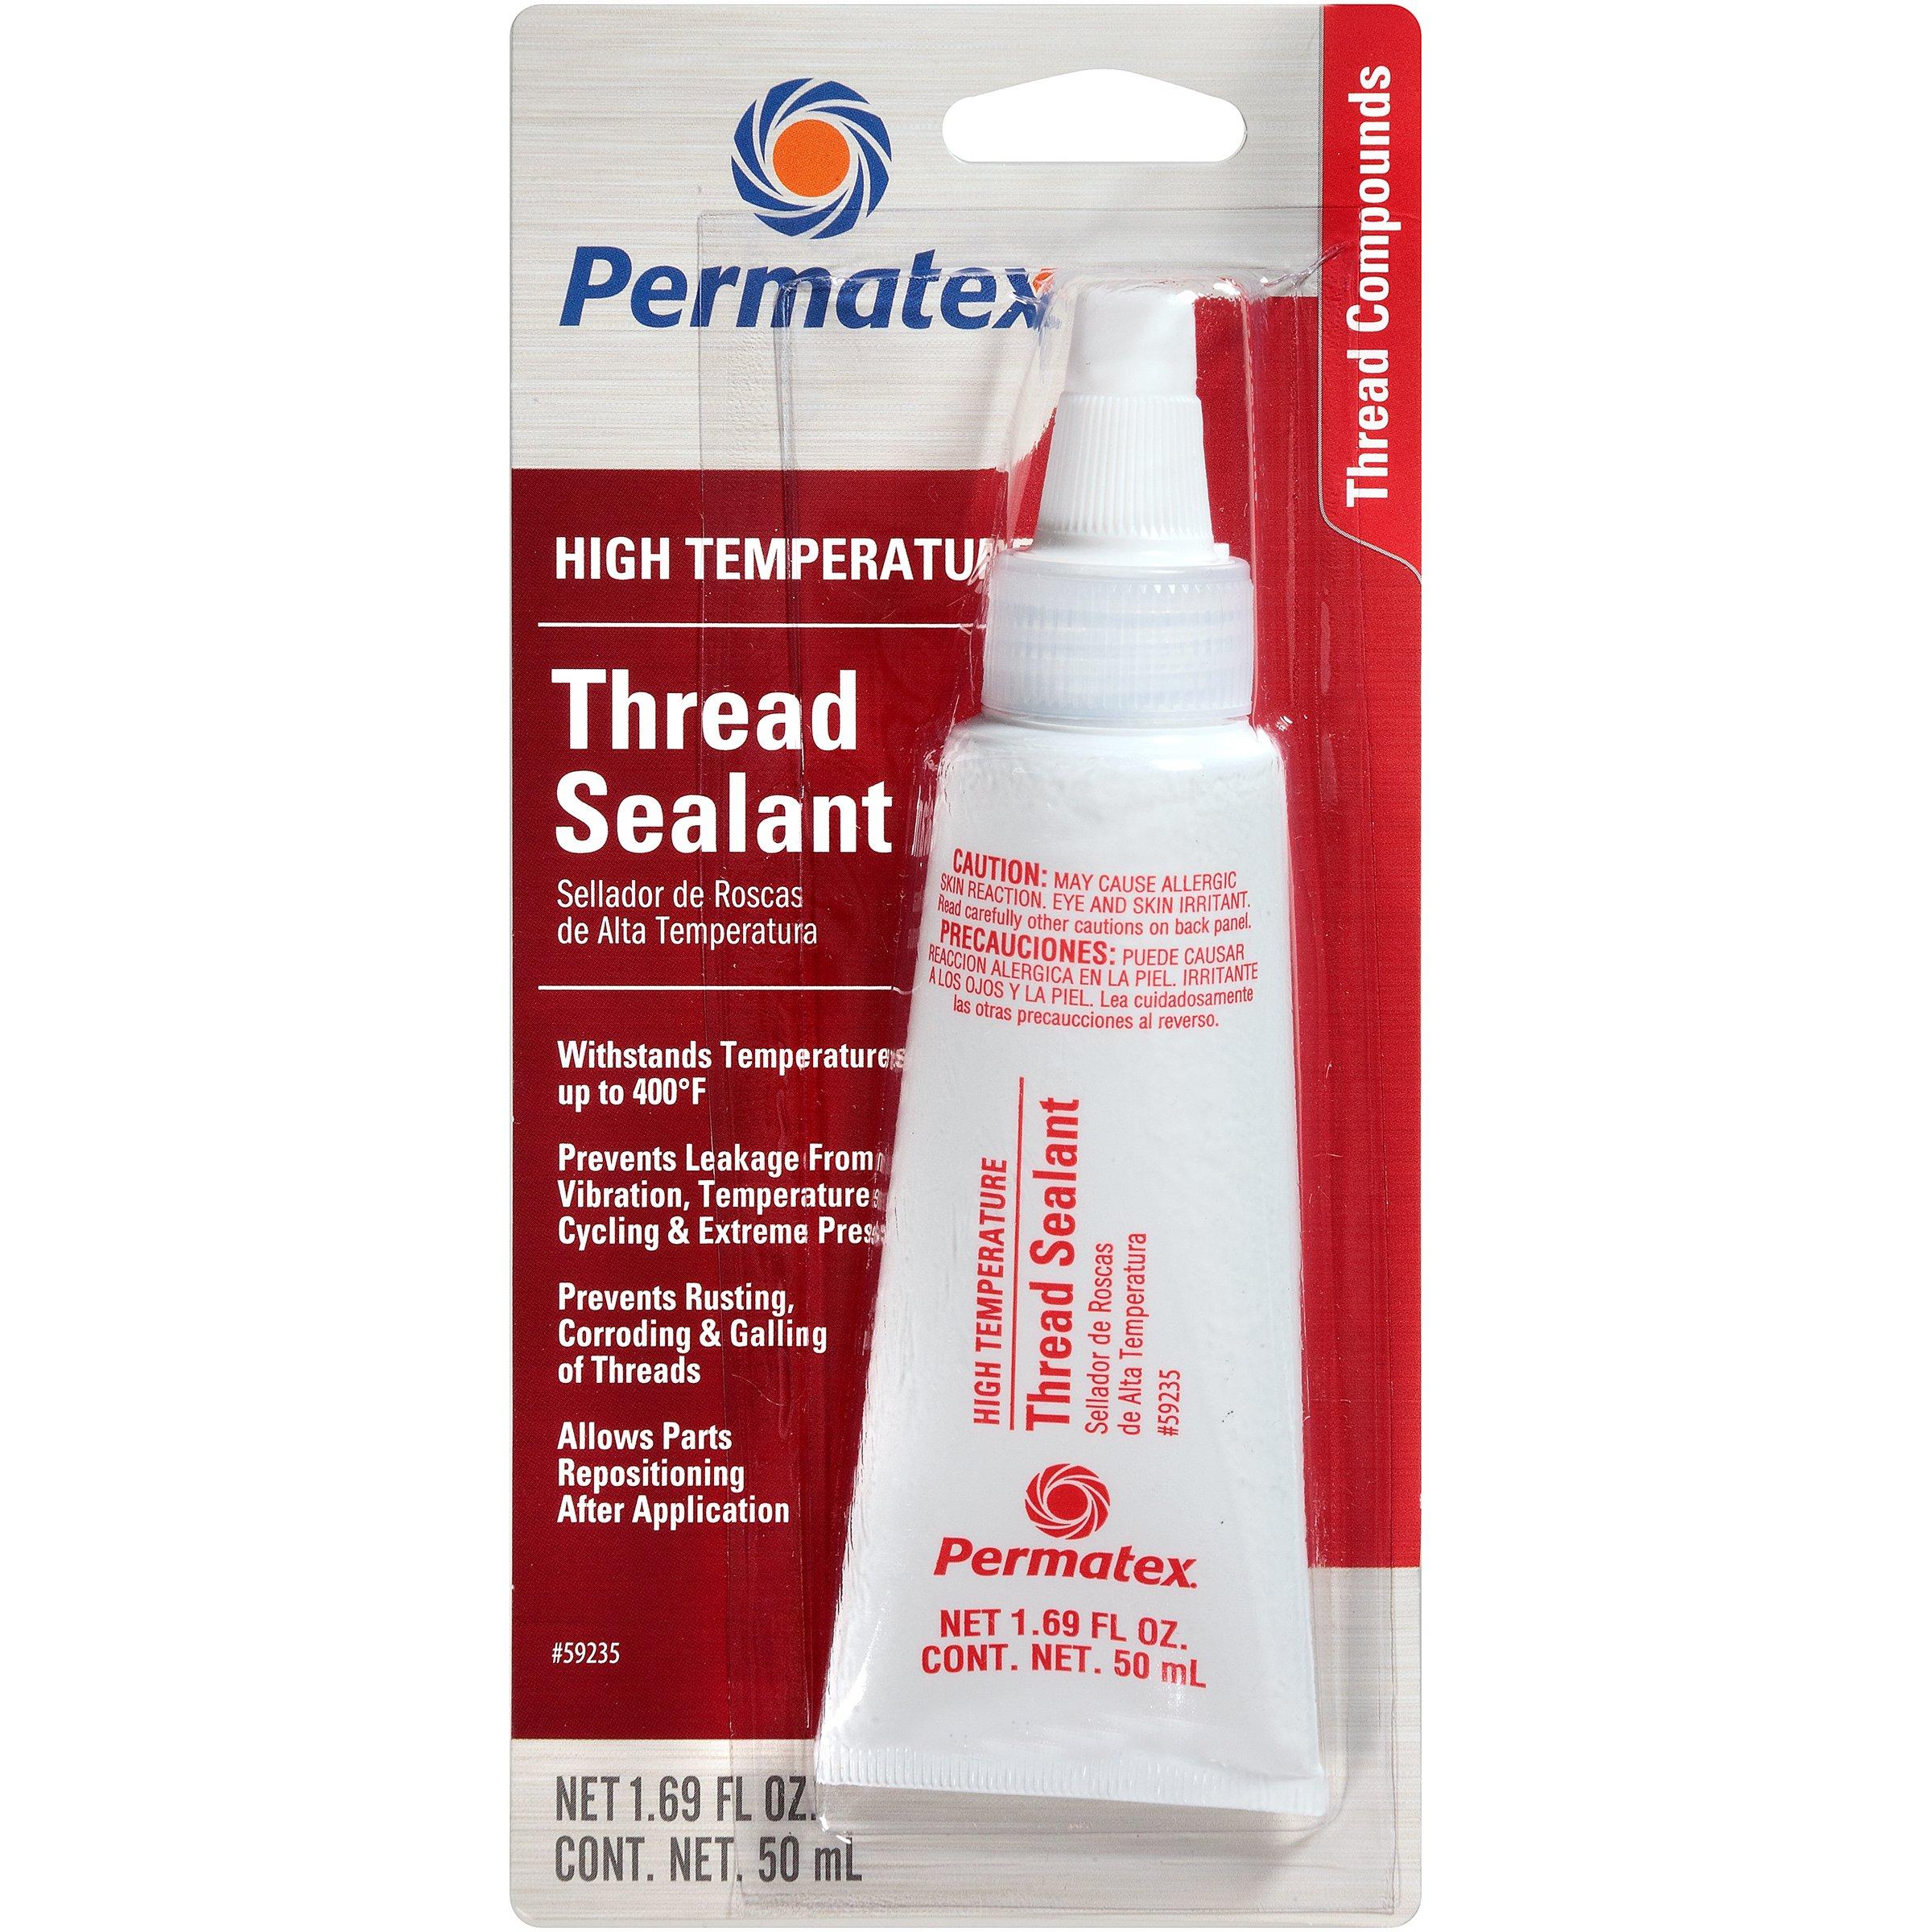 Permatex 59235-6PK High Temperature Thread Sealant, 50 ml (Pack of 6) by Permatex